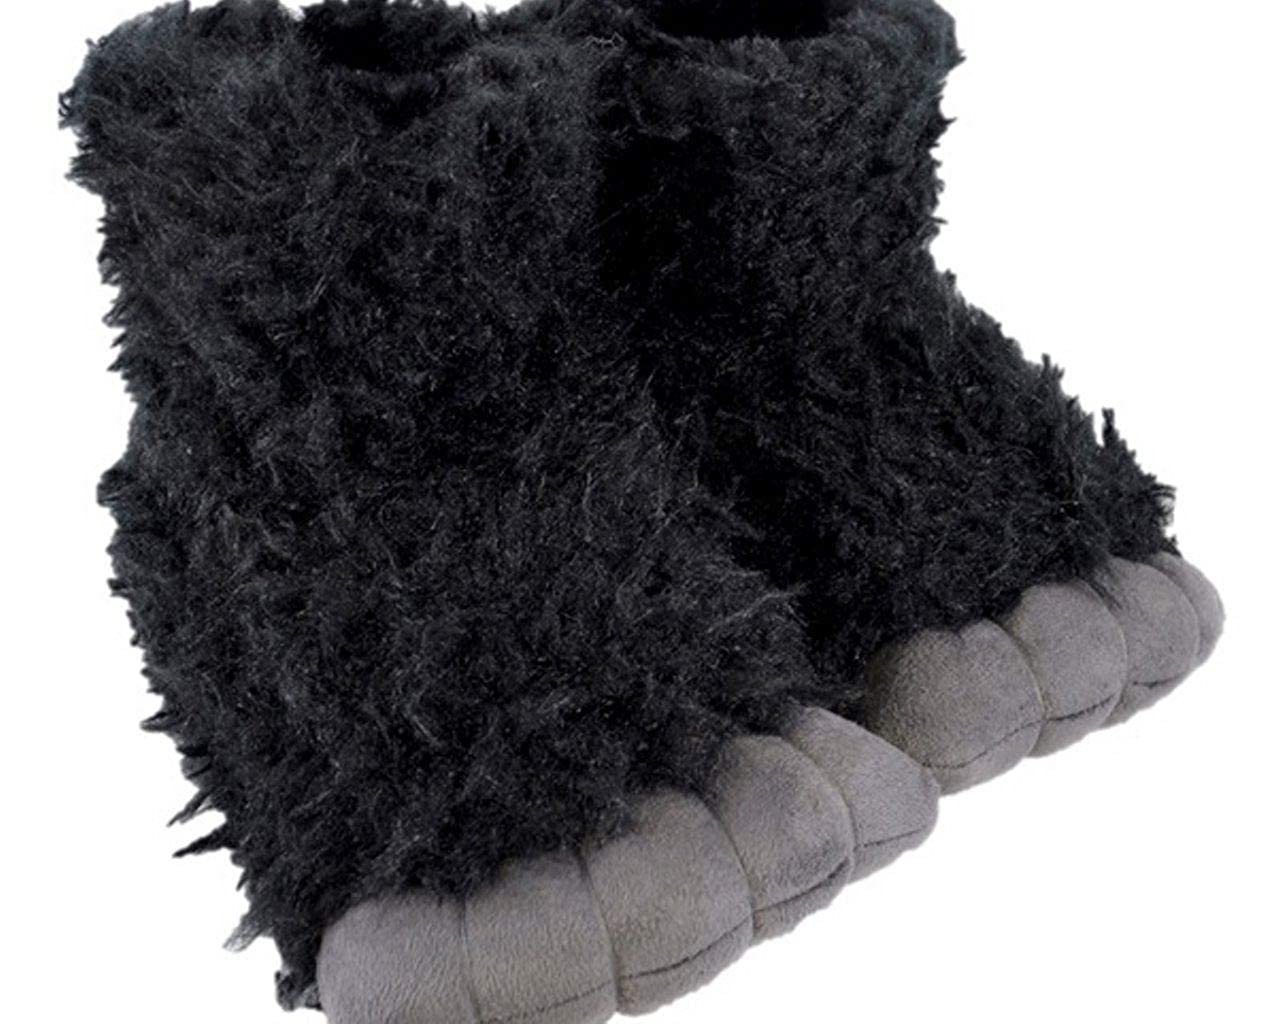 Boys Gorilla Slippers Plush 3D Novelty Footwear